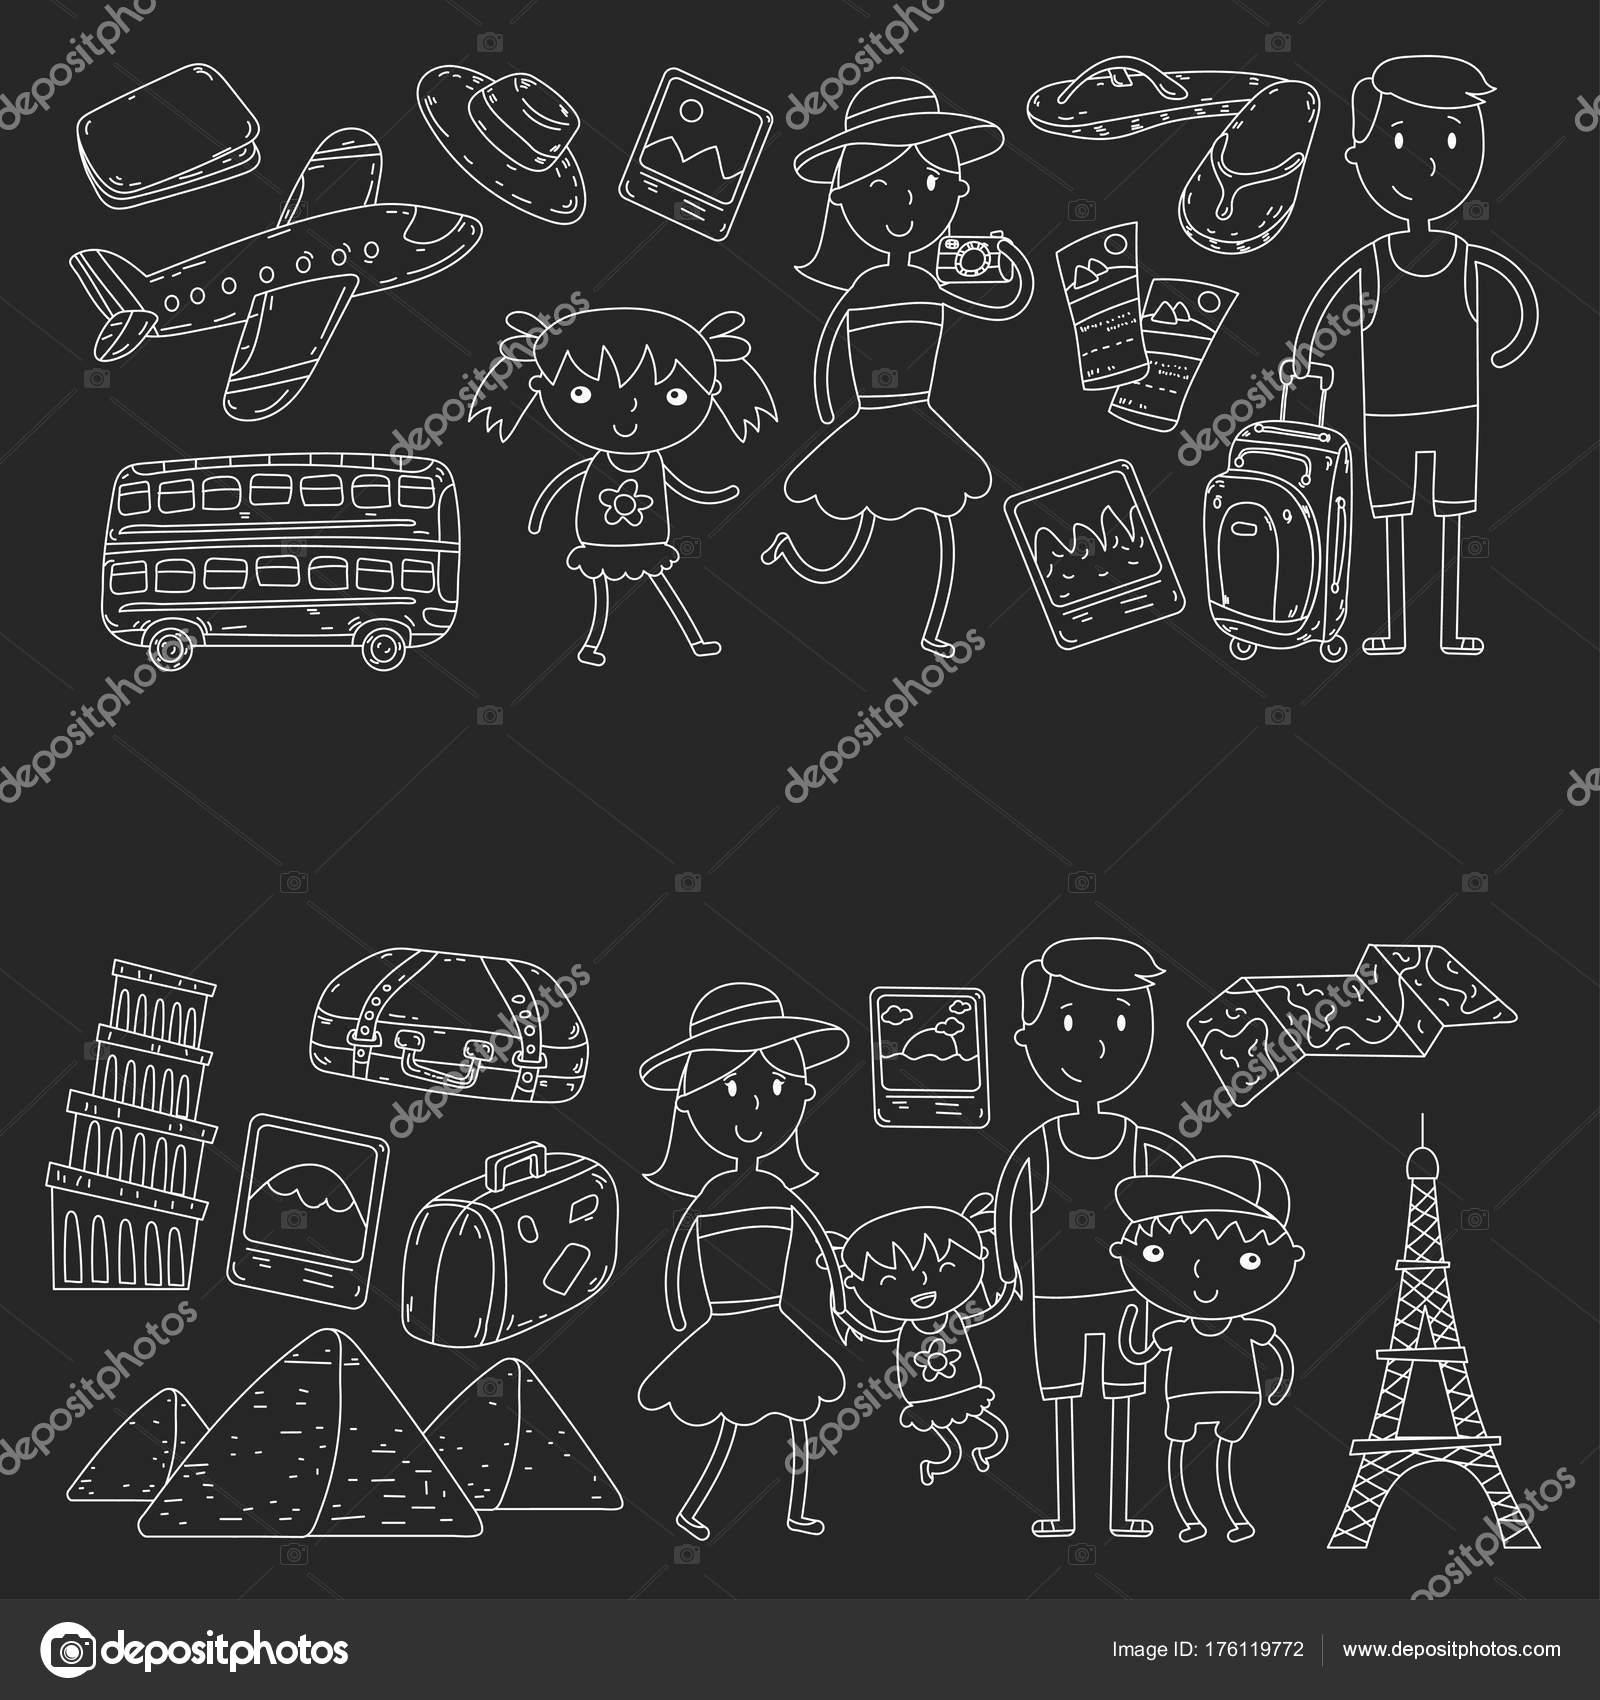 Doodle Vektorove Sada Cestovani Dovolena Dobrodruzstvi Deti S